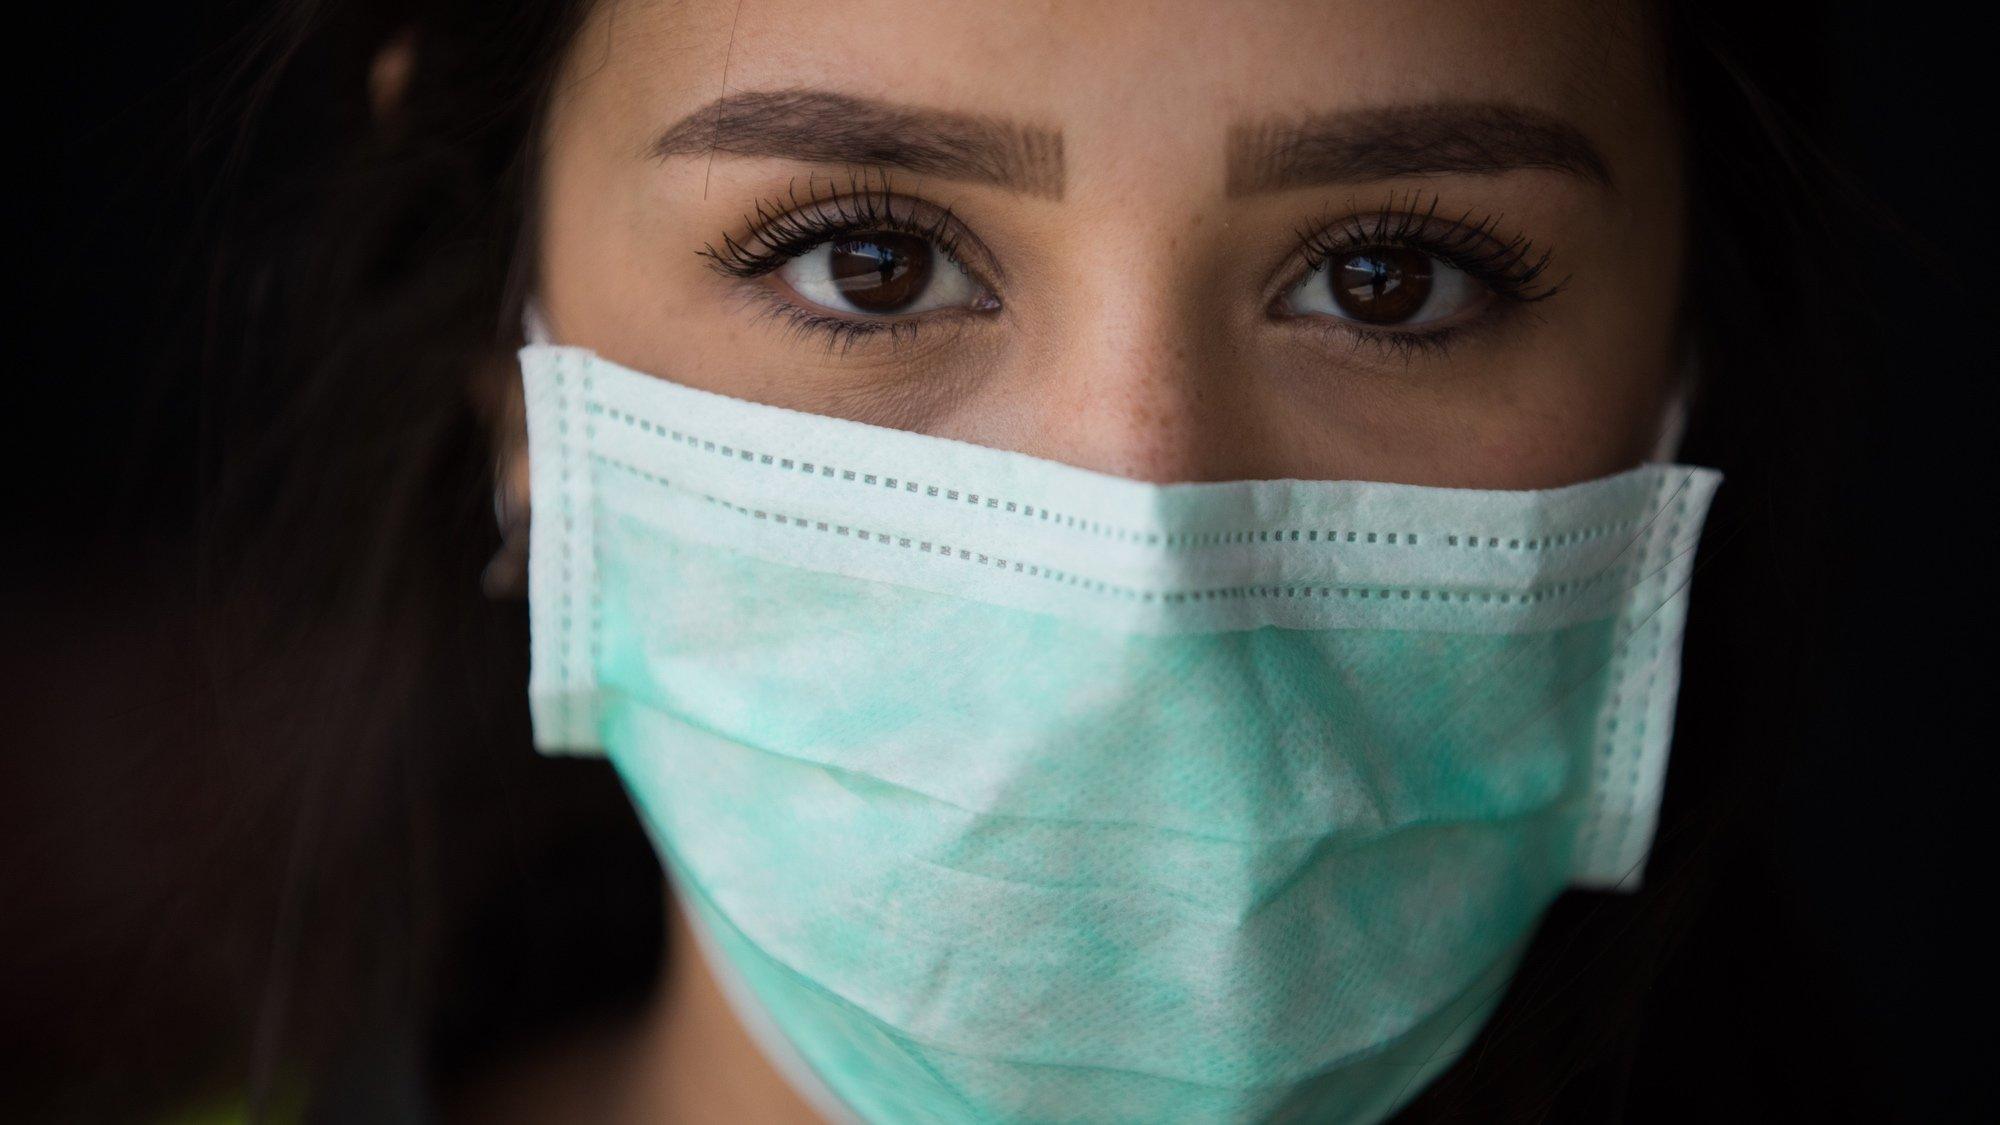 Is the coronavirus just a conspiracy?